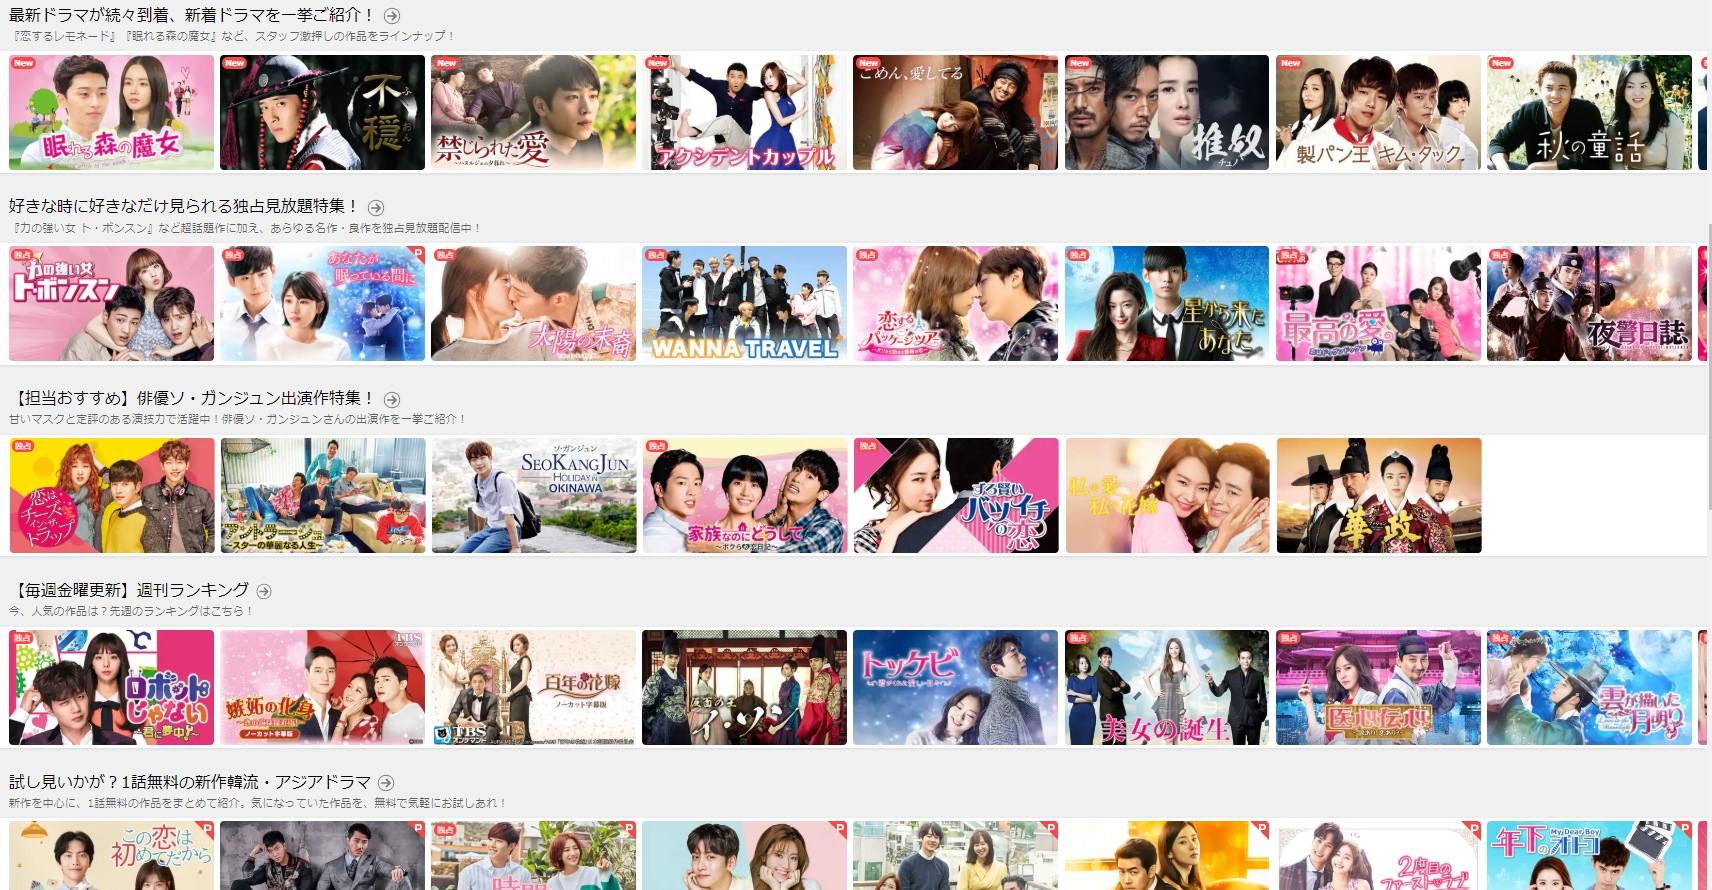 U-NEXTの最新(2019年4月末)韓国ドラマ一覧